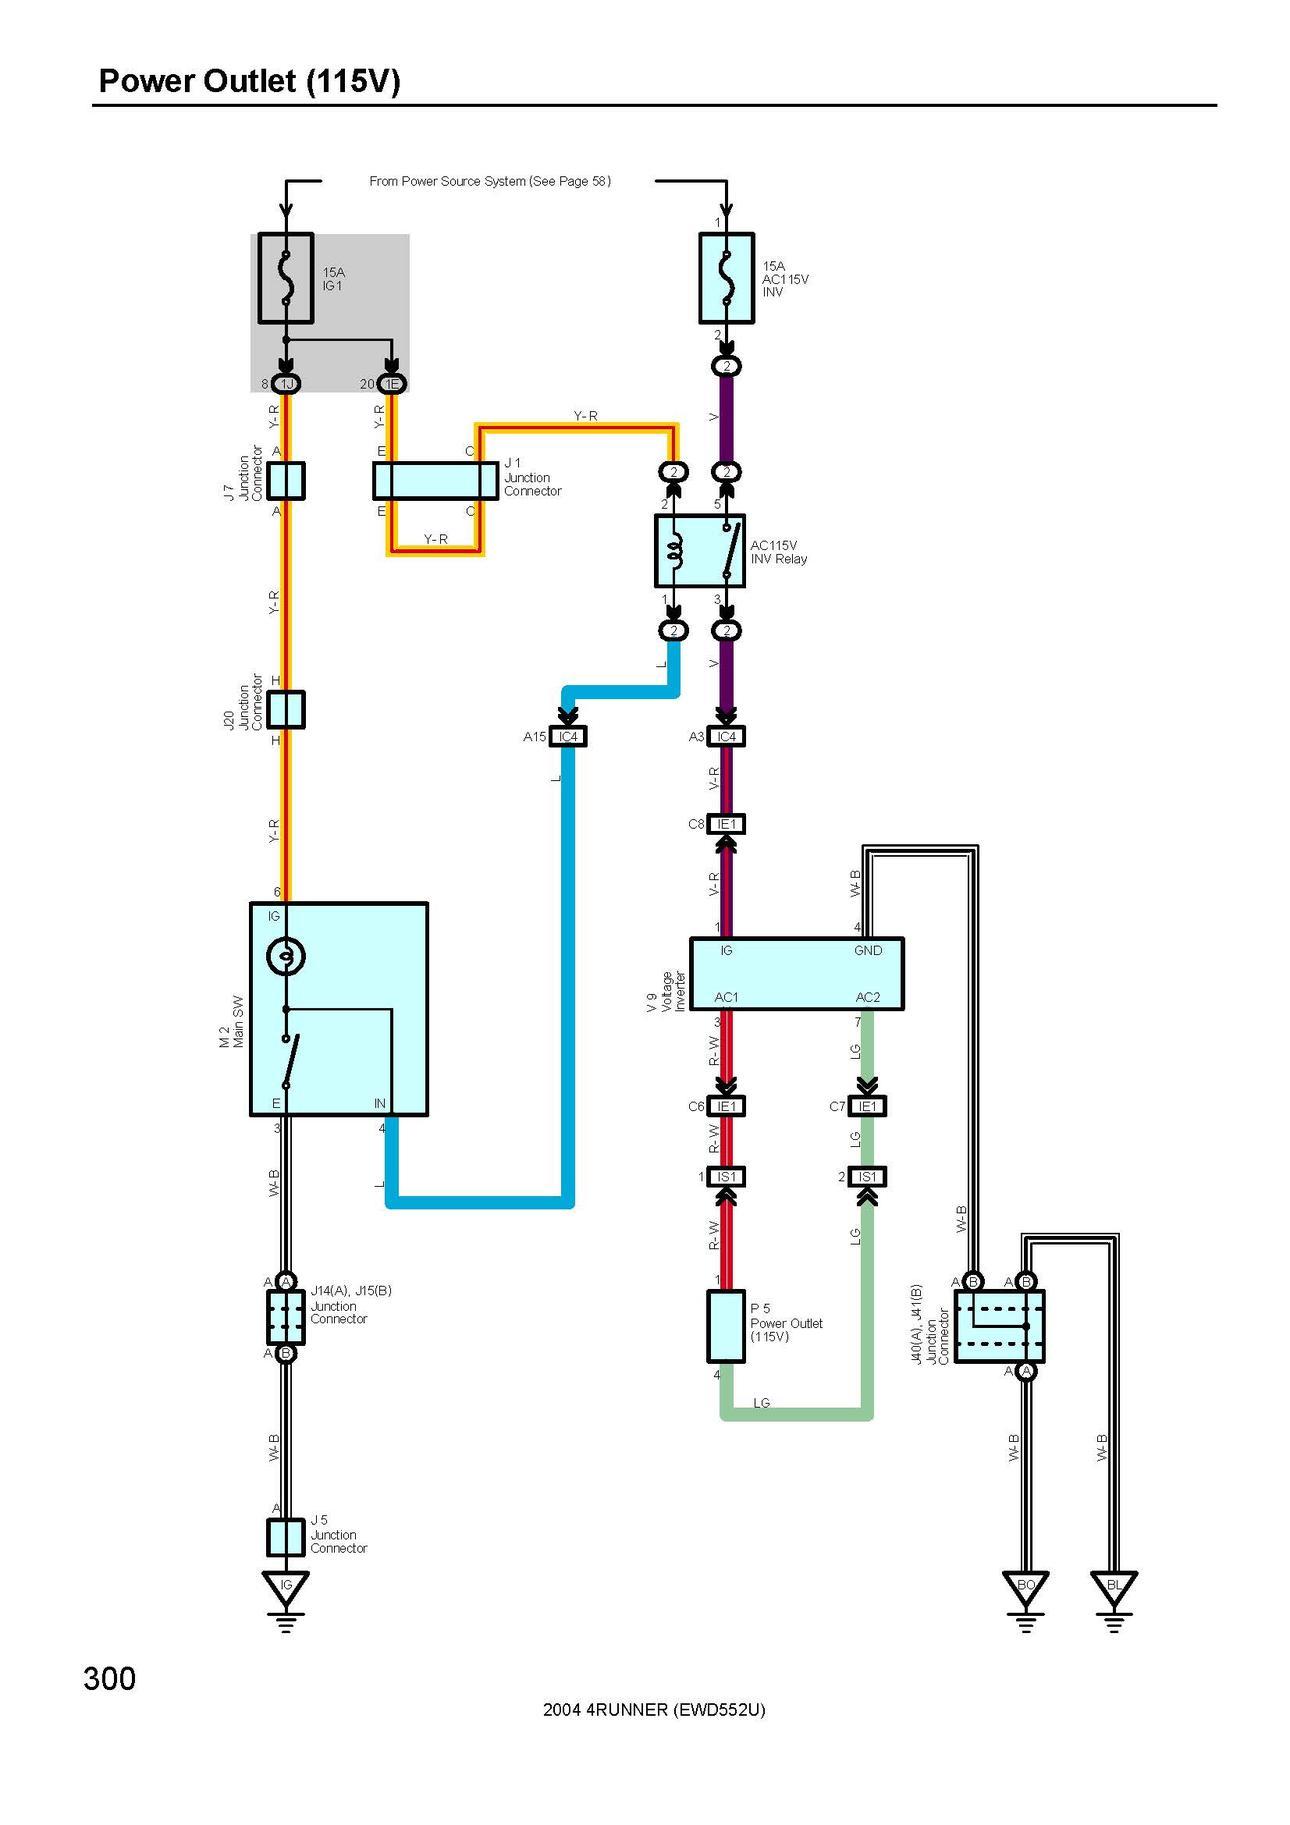 115v Ac Oem Inverter Wiring Diagram  Pin Out